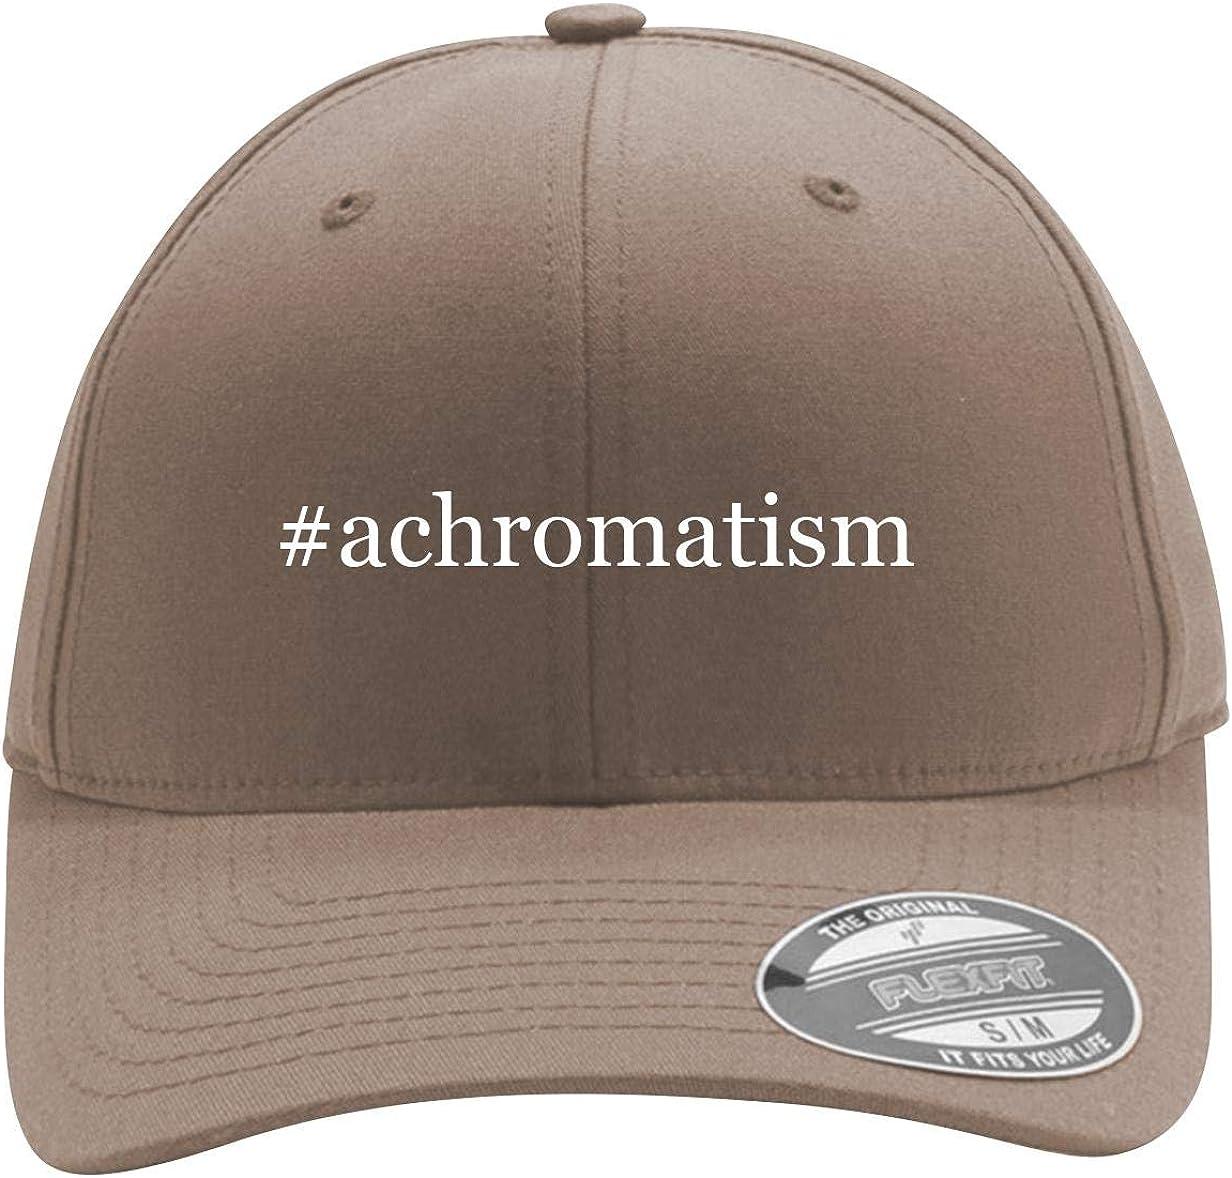 #Achromatism - Men's Hashtag Flexfit Baseball Cap Hat